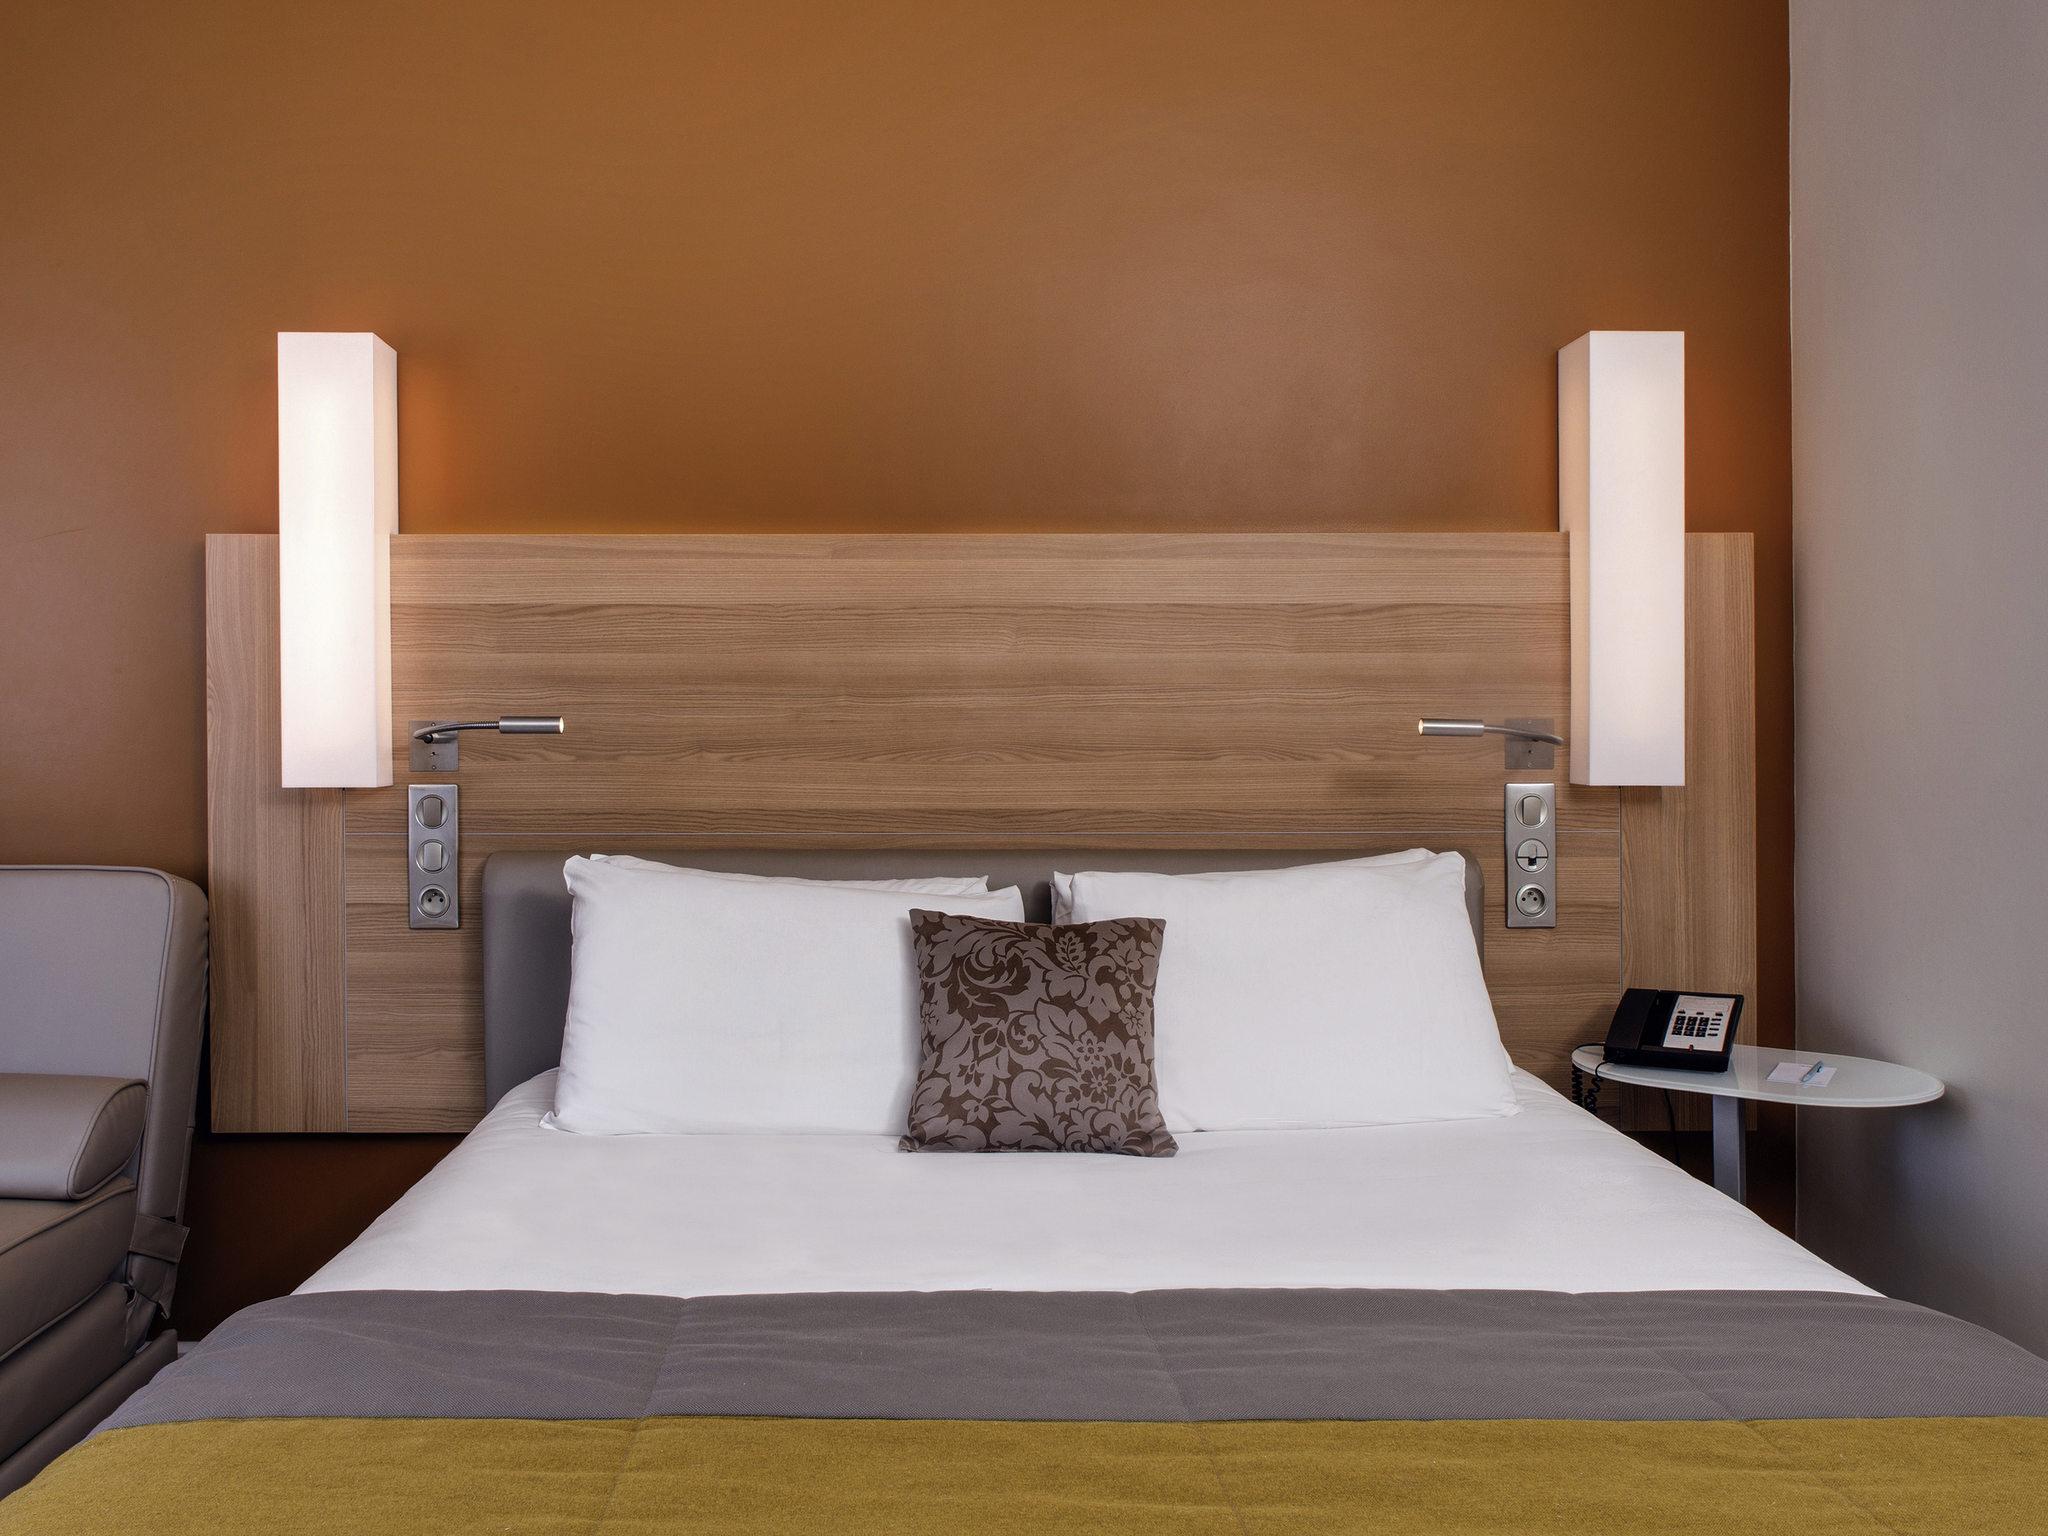 فندق - Hôtel Mercure Mâcon Bord de Saône